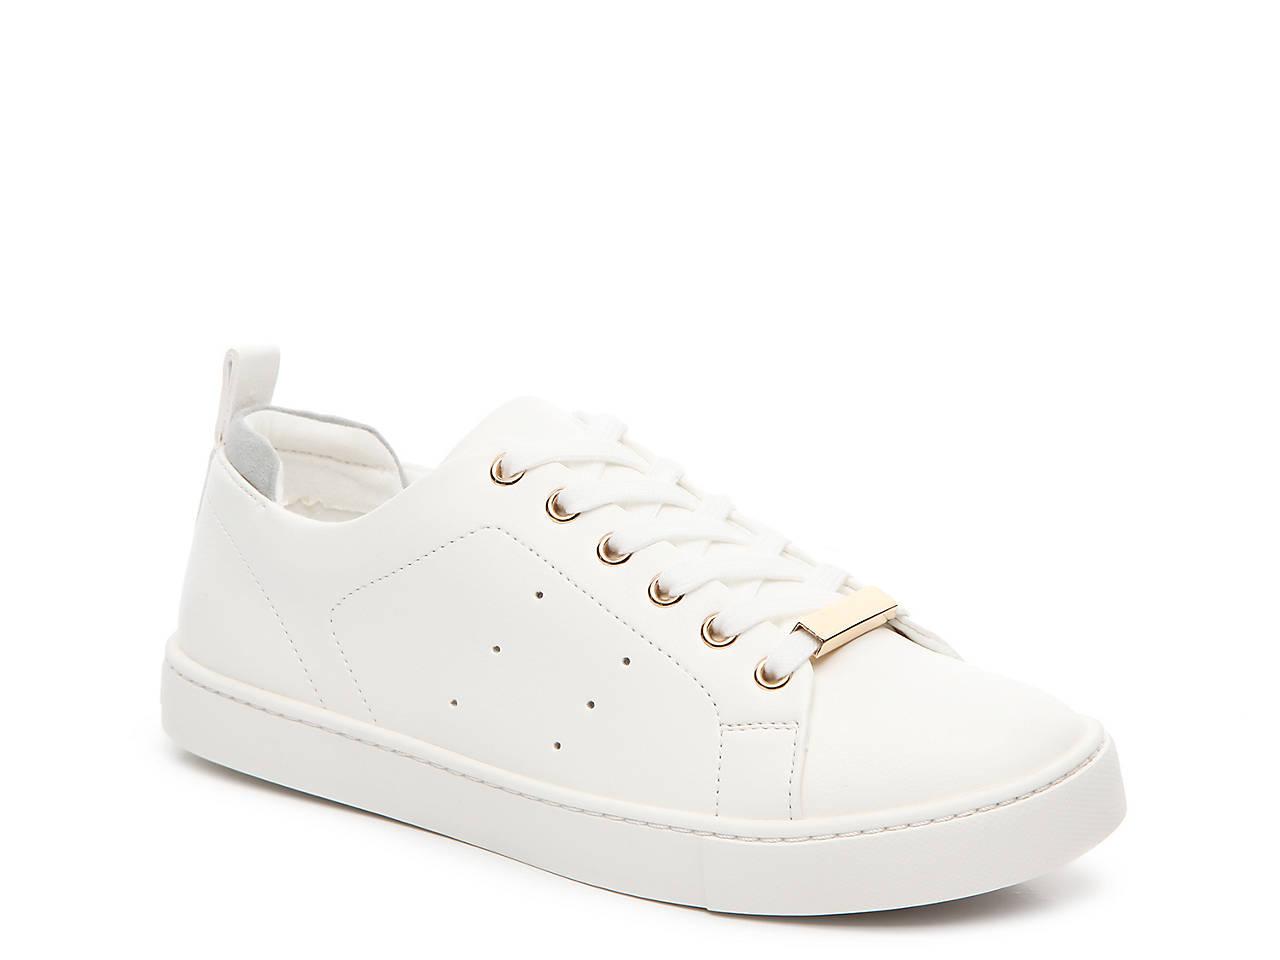 6e96f510127 Aldo Aroalla Sneaker Women s Shoes